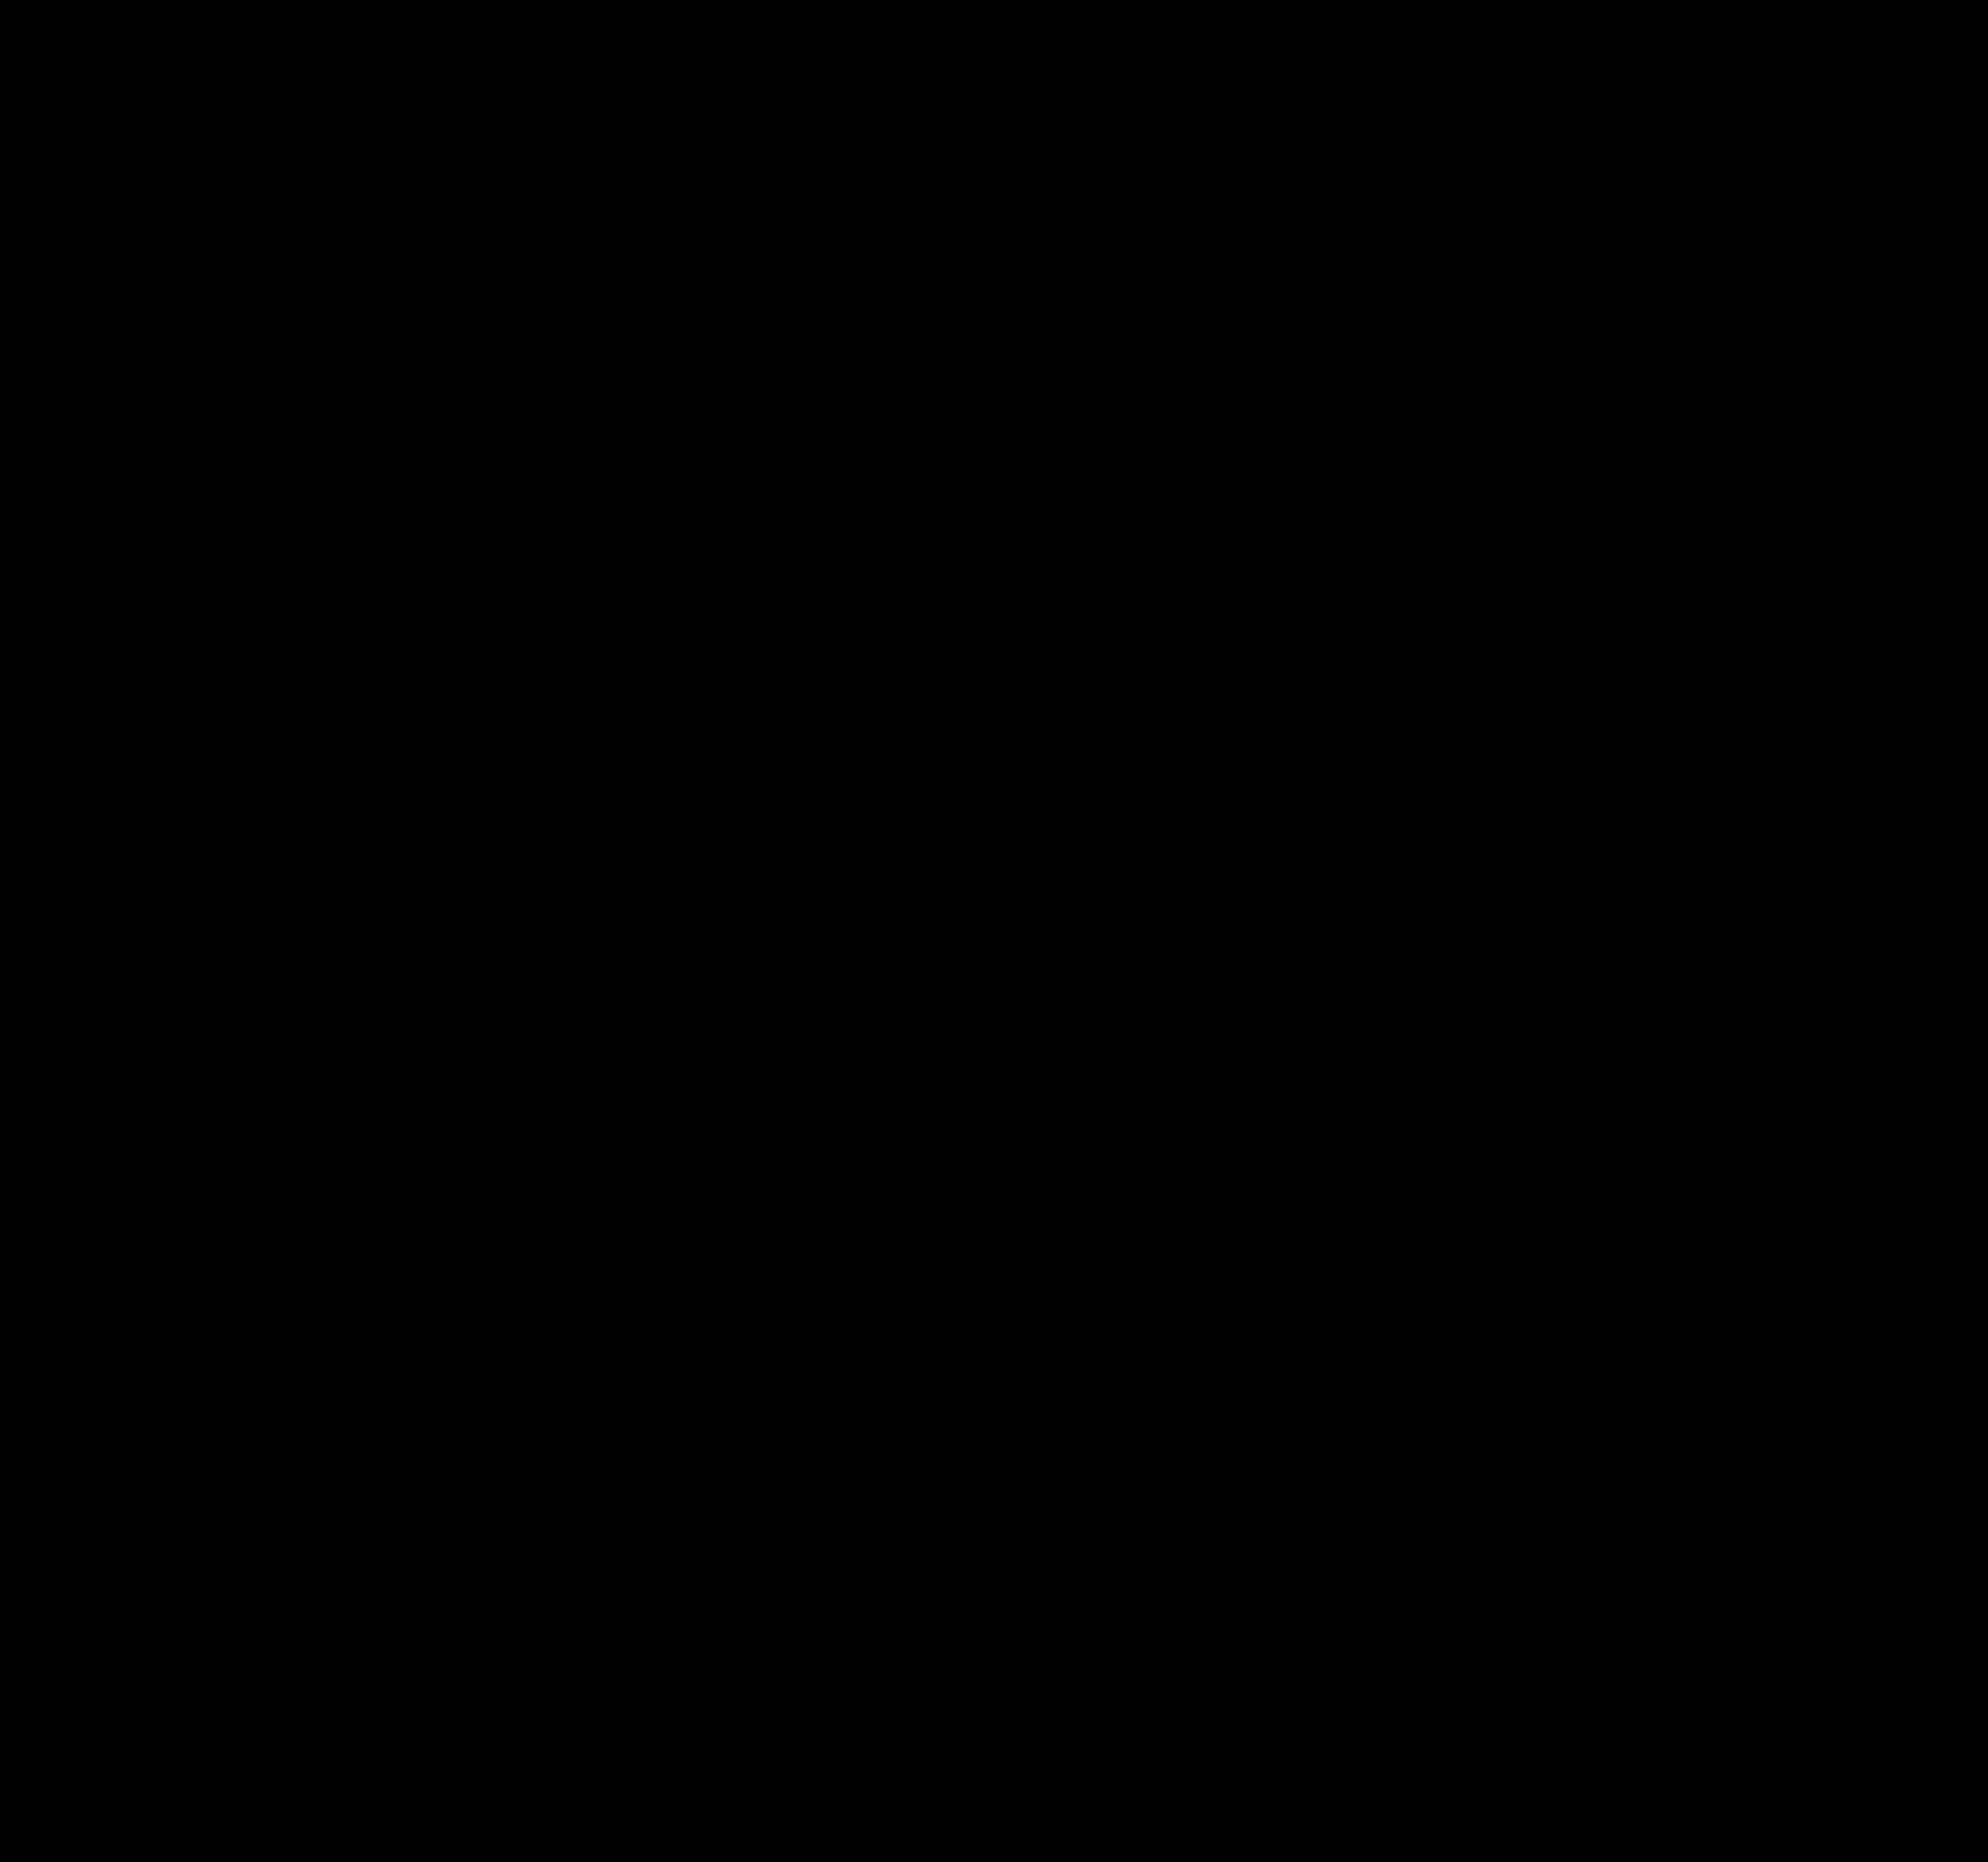 Diamond Outline Vector   Clipart Best